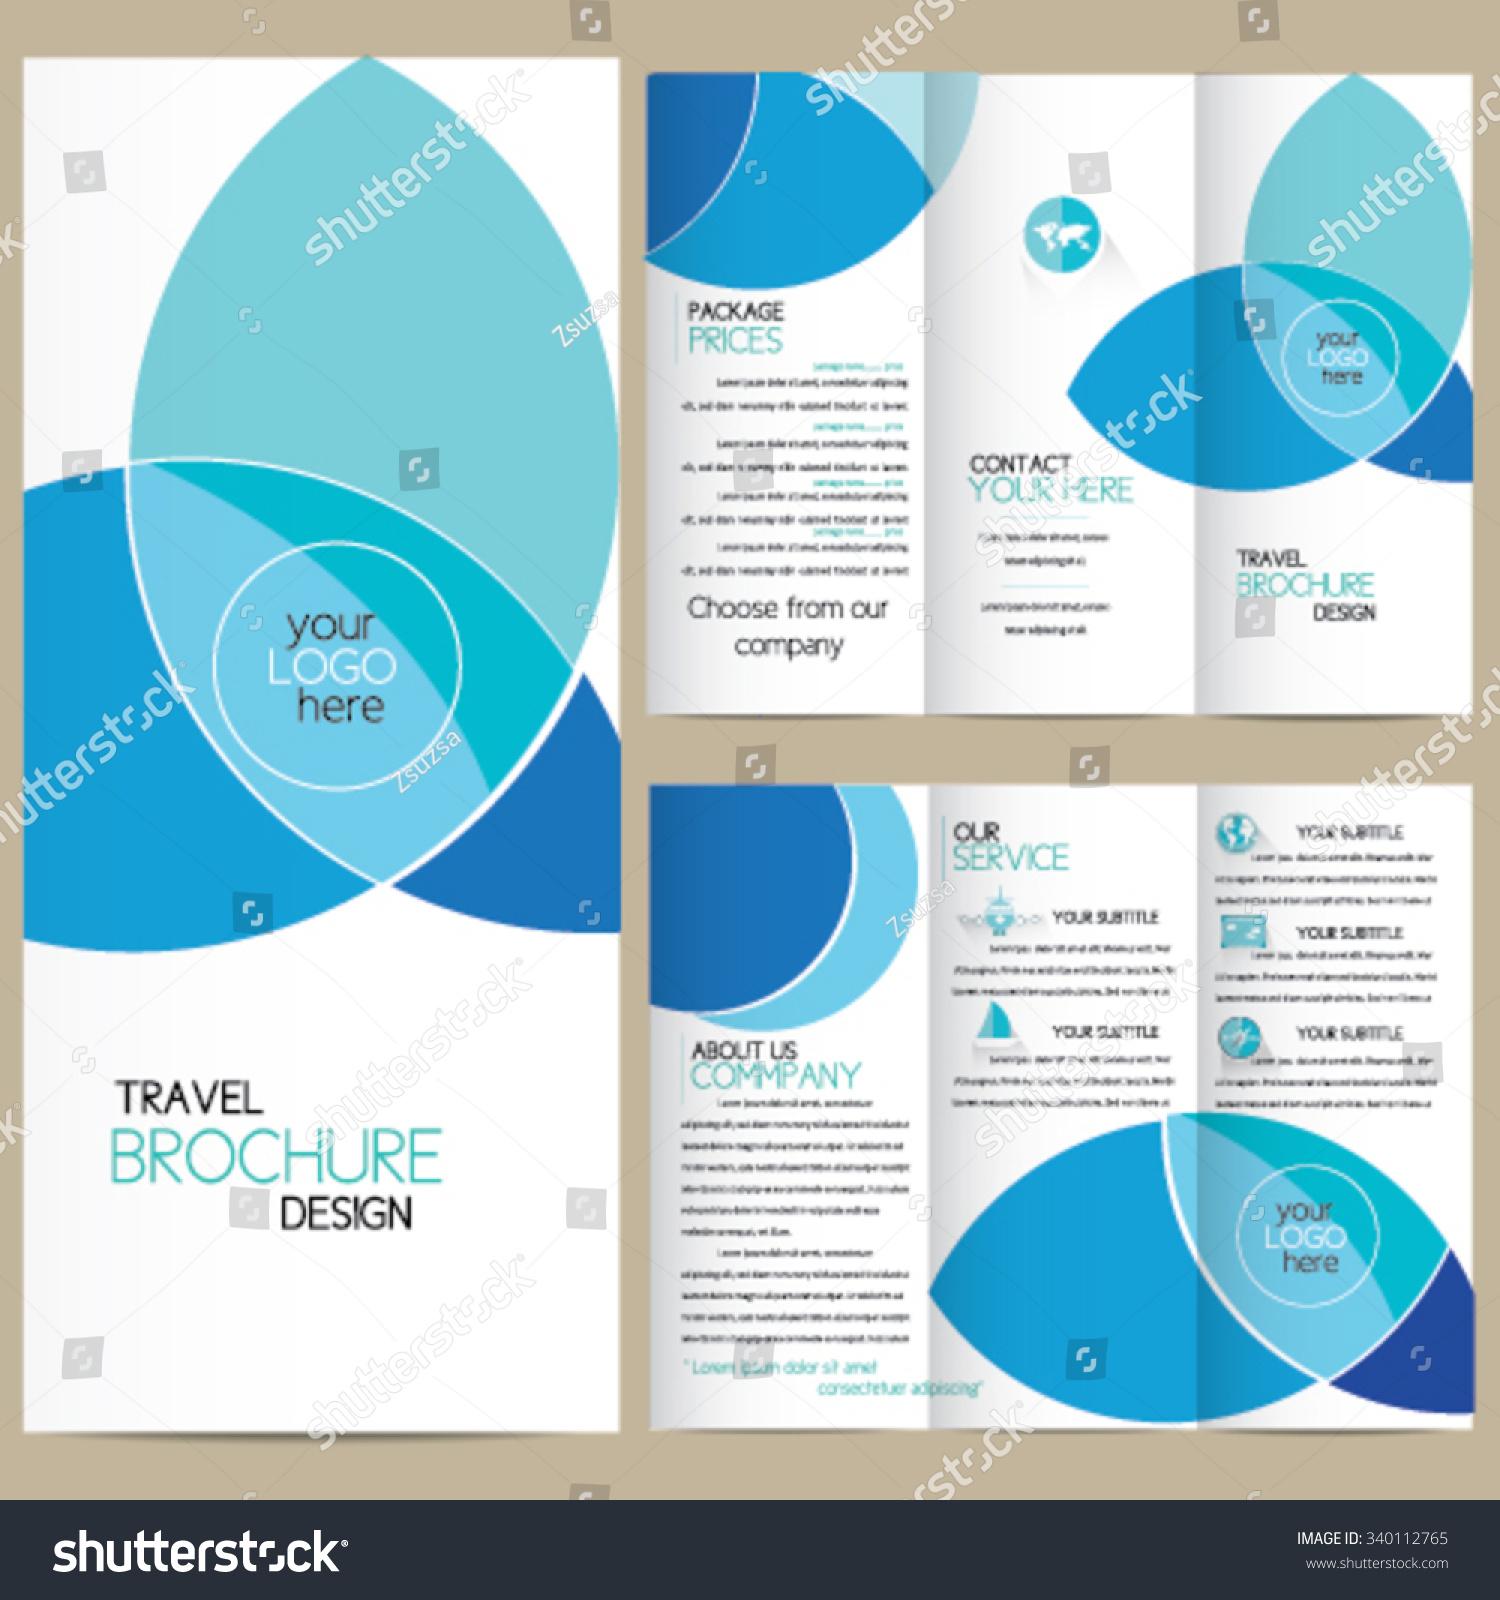 travel brochure design